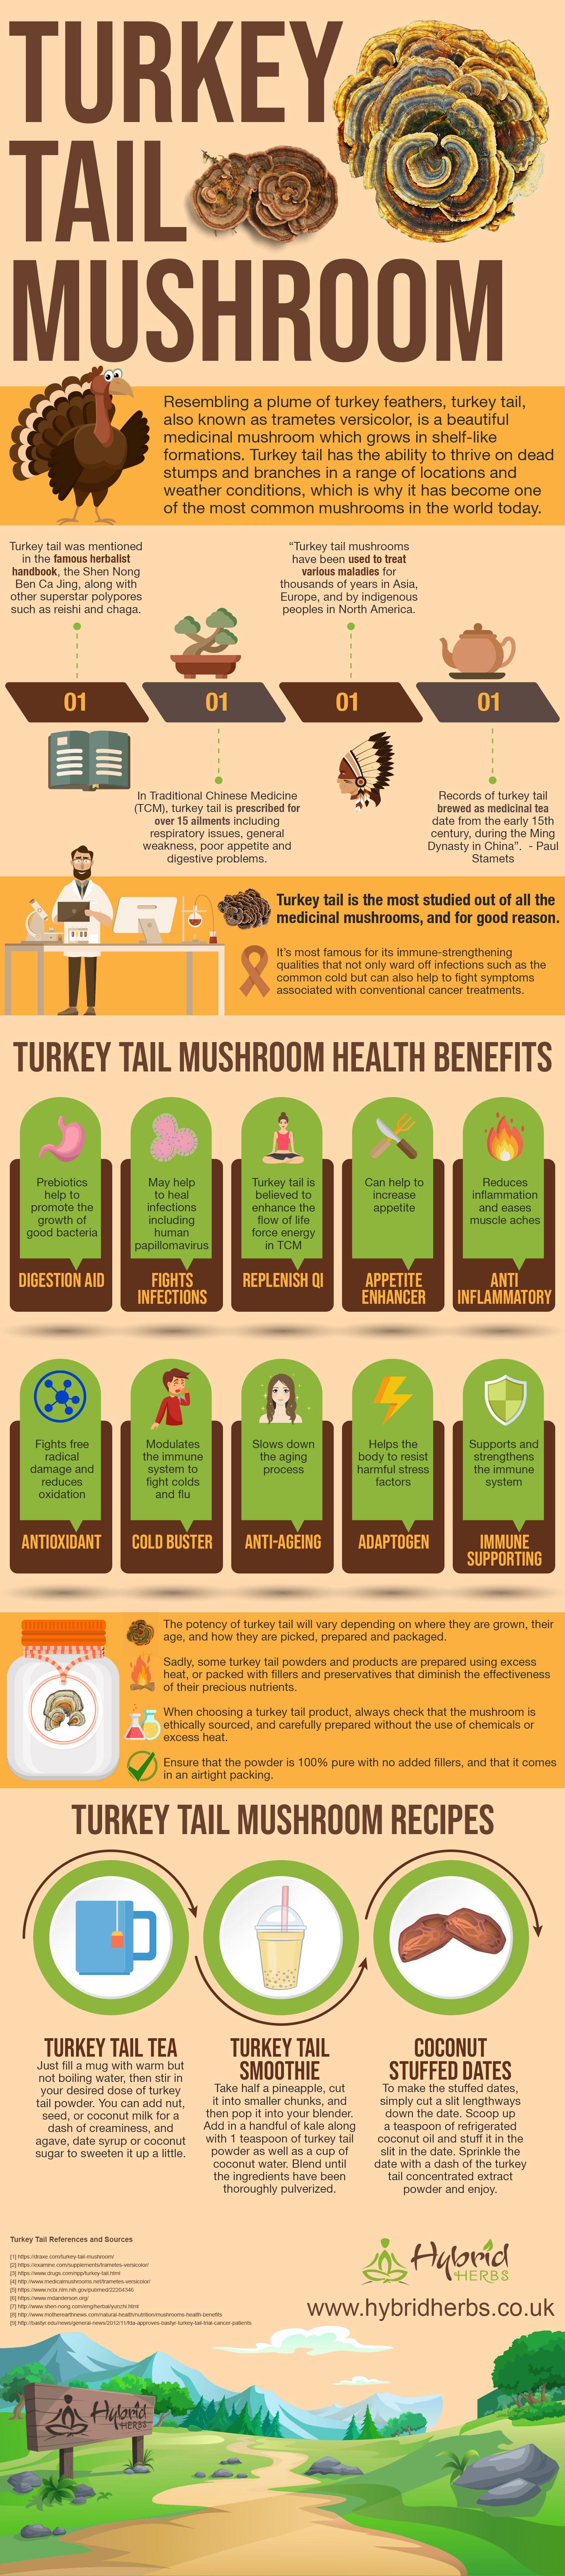 turkey-tail-mushroom-benefits.jpg